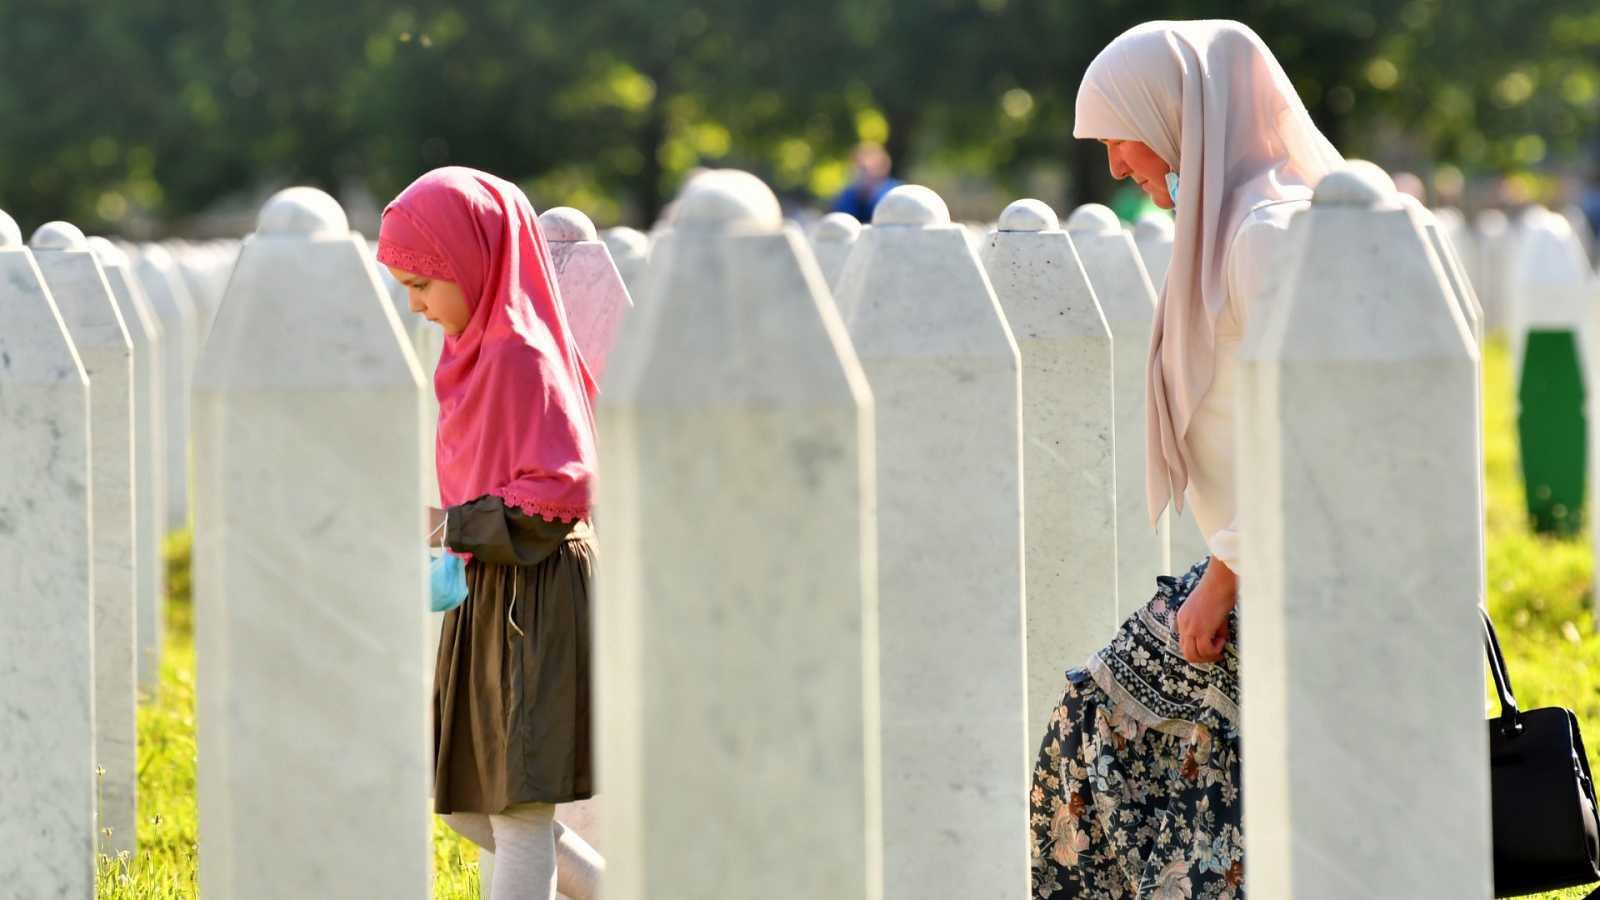 Reportajes 5 Continentes - 25 años de la matanza de Srebrenica